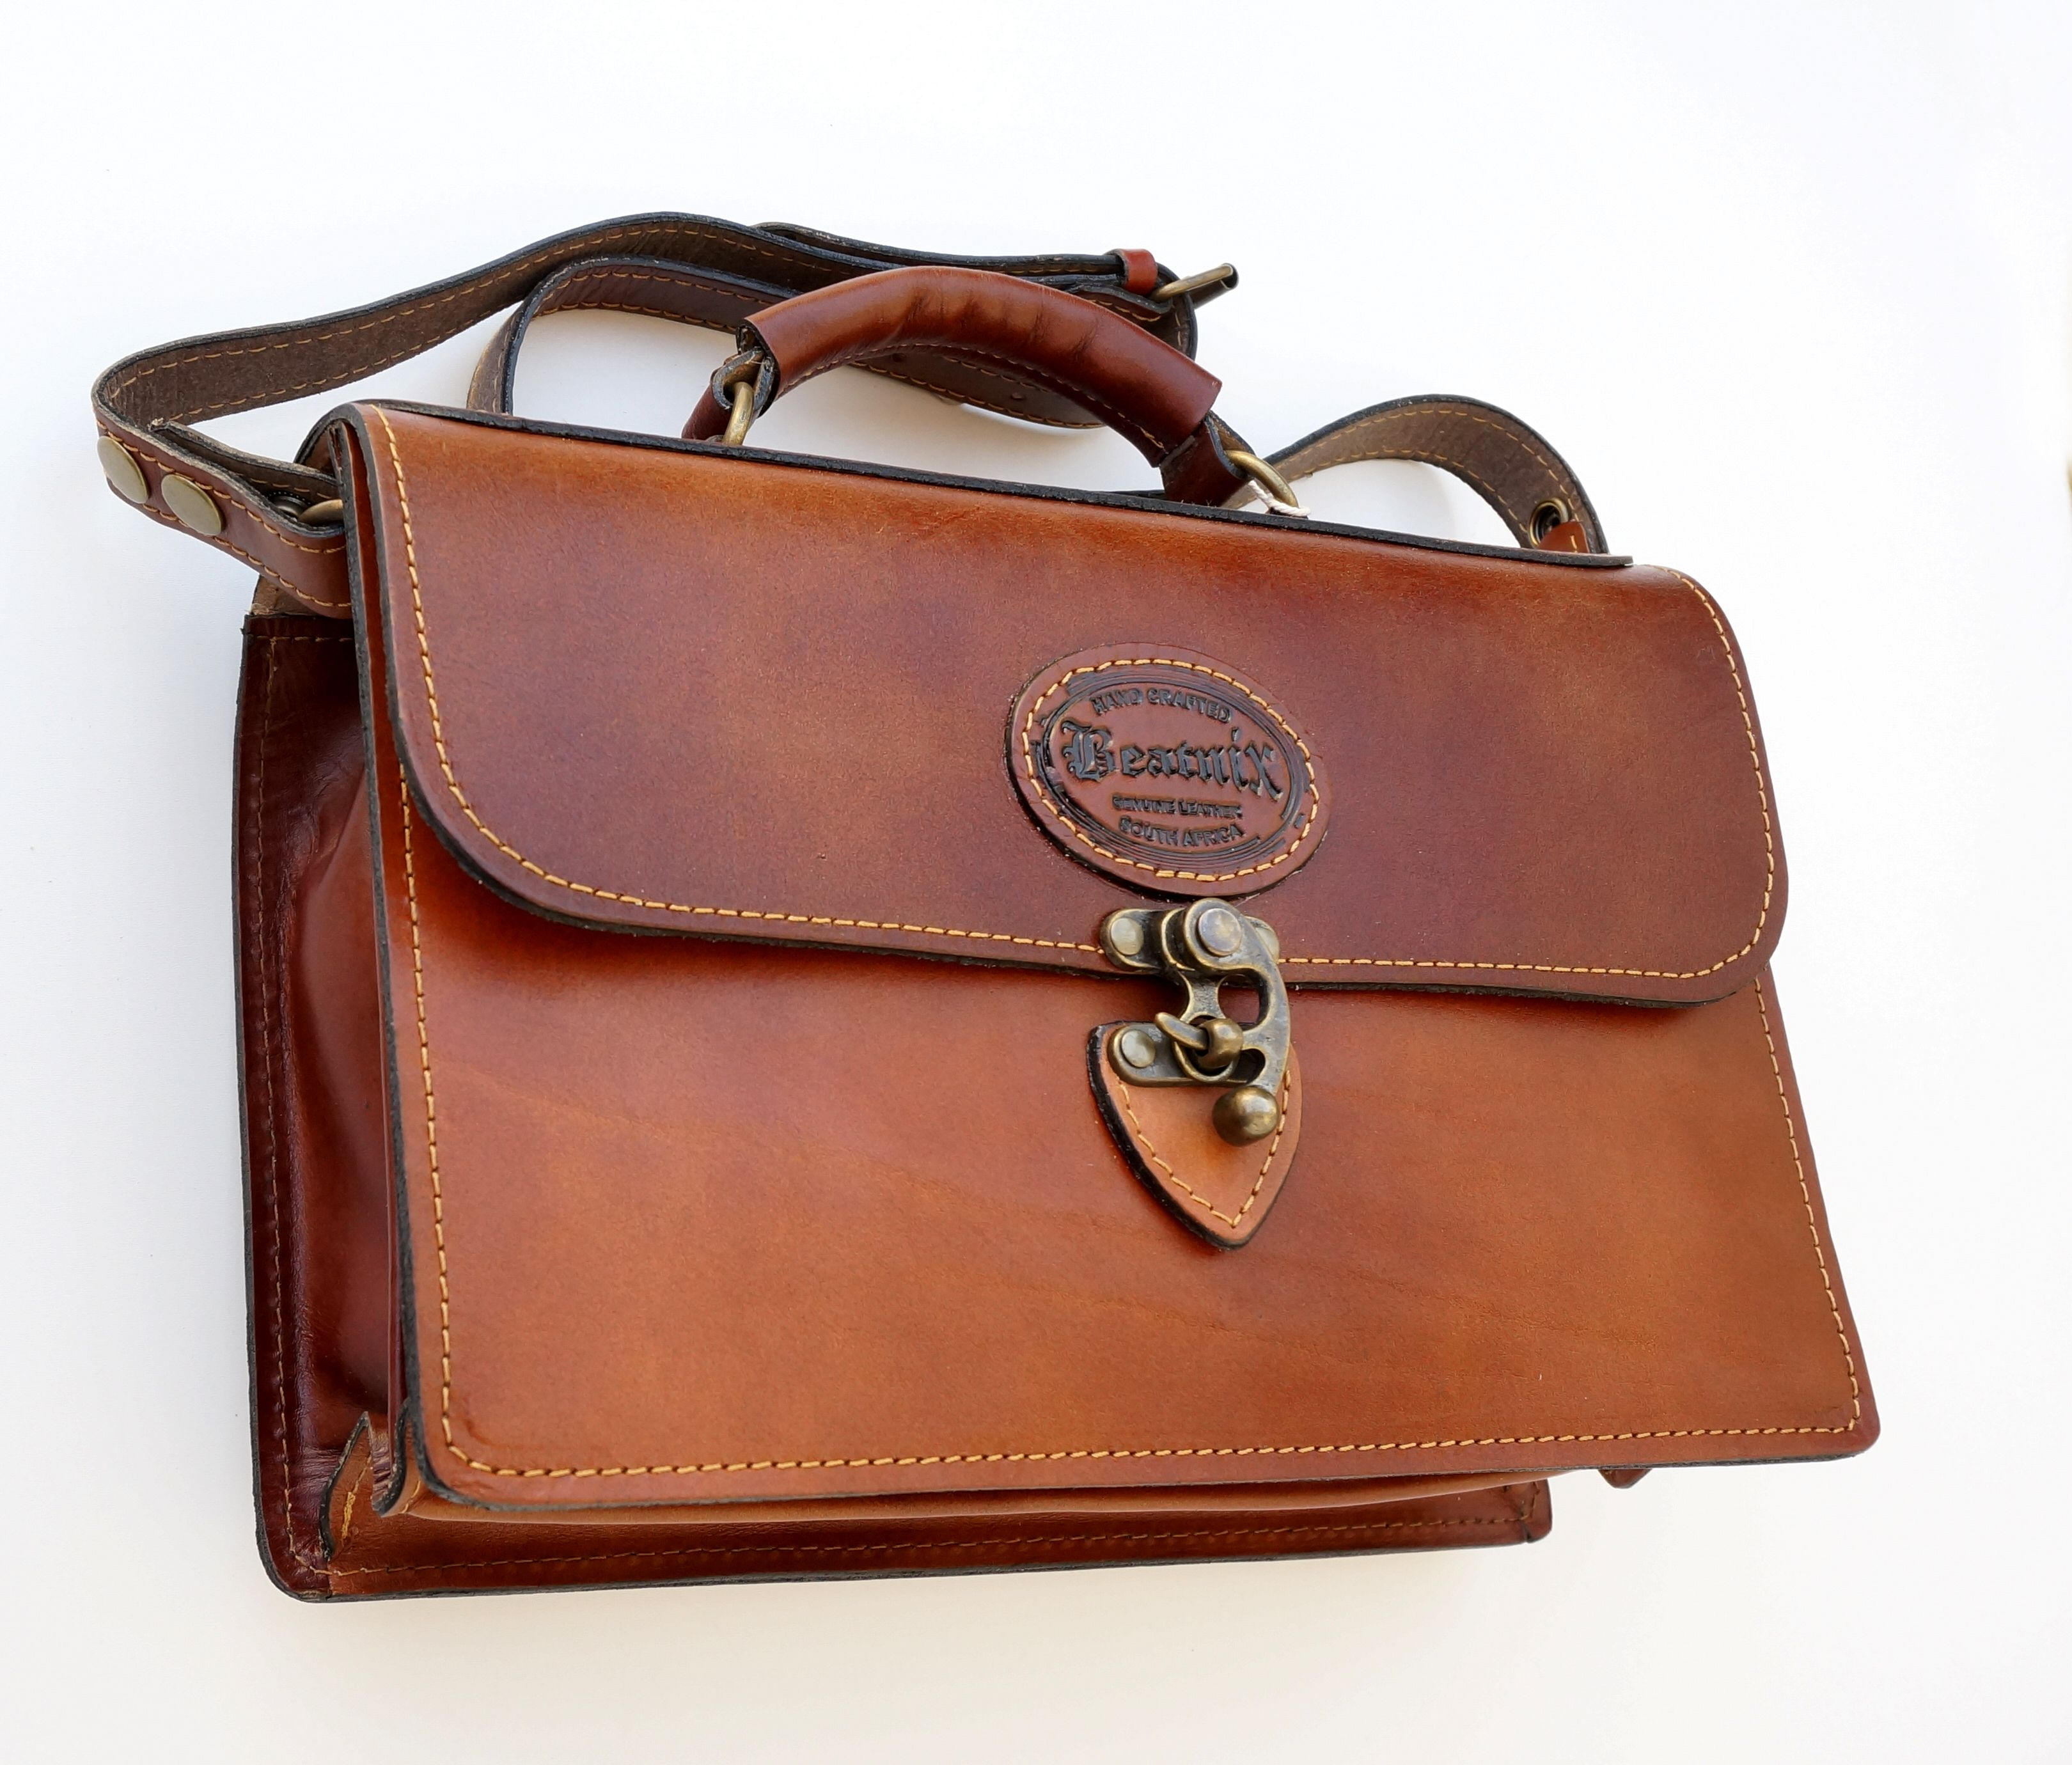 3a38d0294de Beatnix Genuine Leather Handbag Handcrafted in South Africa ...